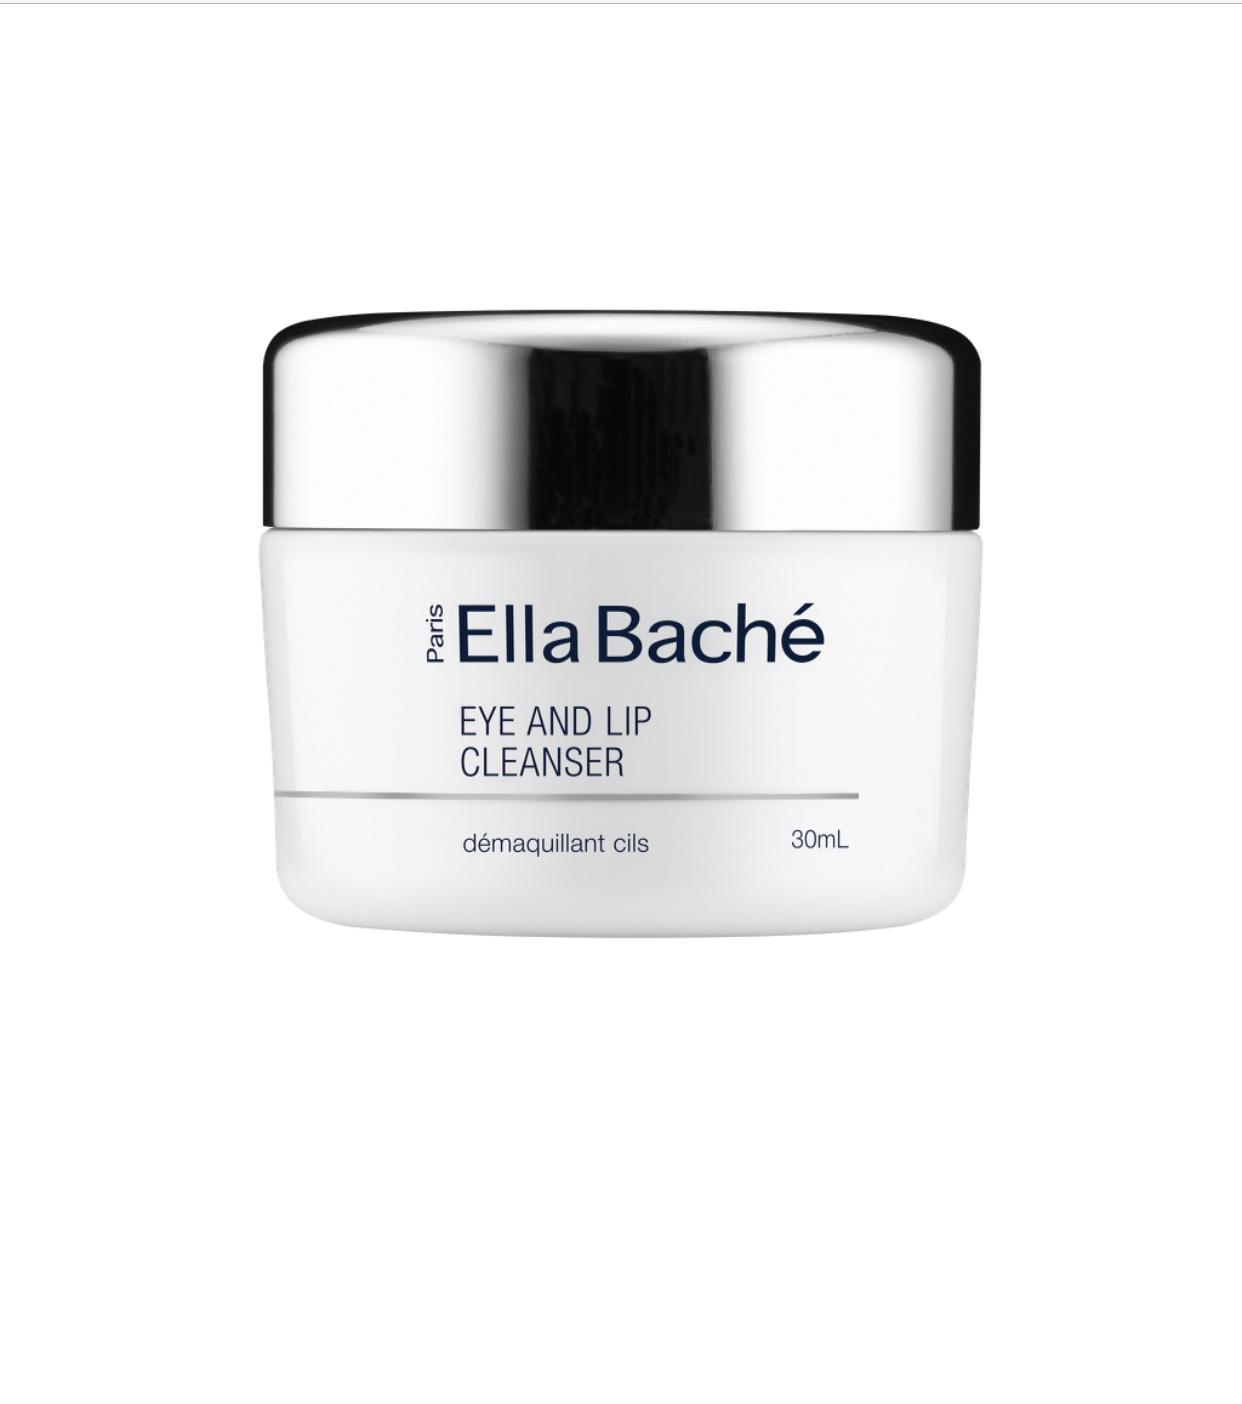 Ella Baché Eye And Lip Cleanser